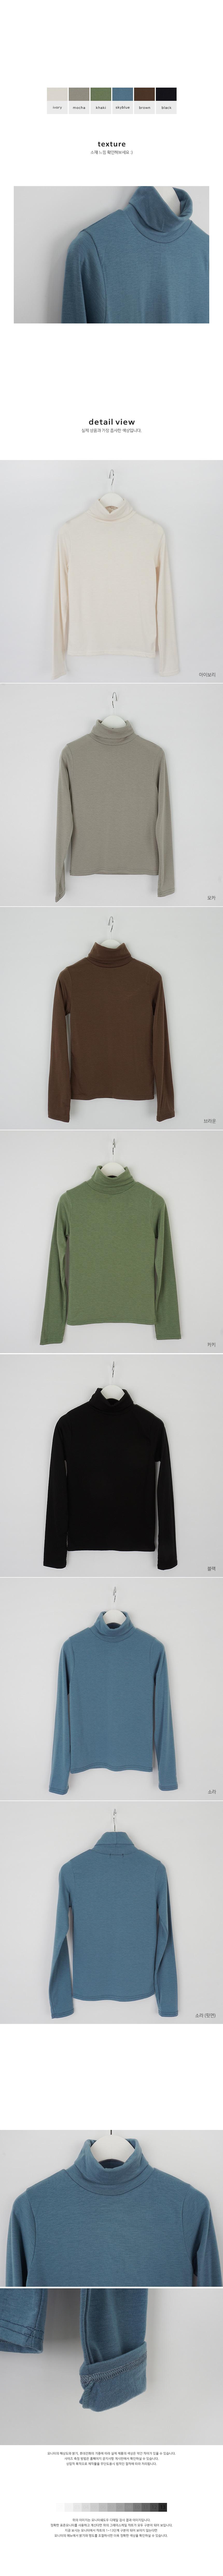 Fleece-lined Turtleneck T-shirt